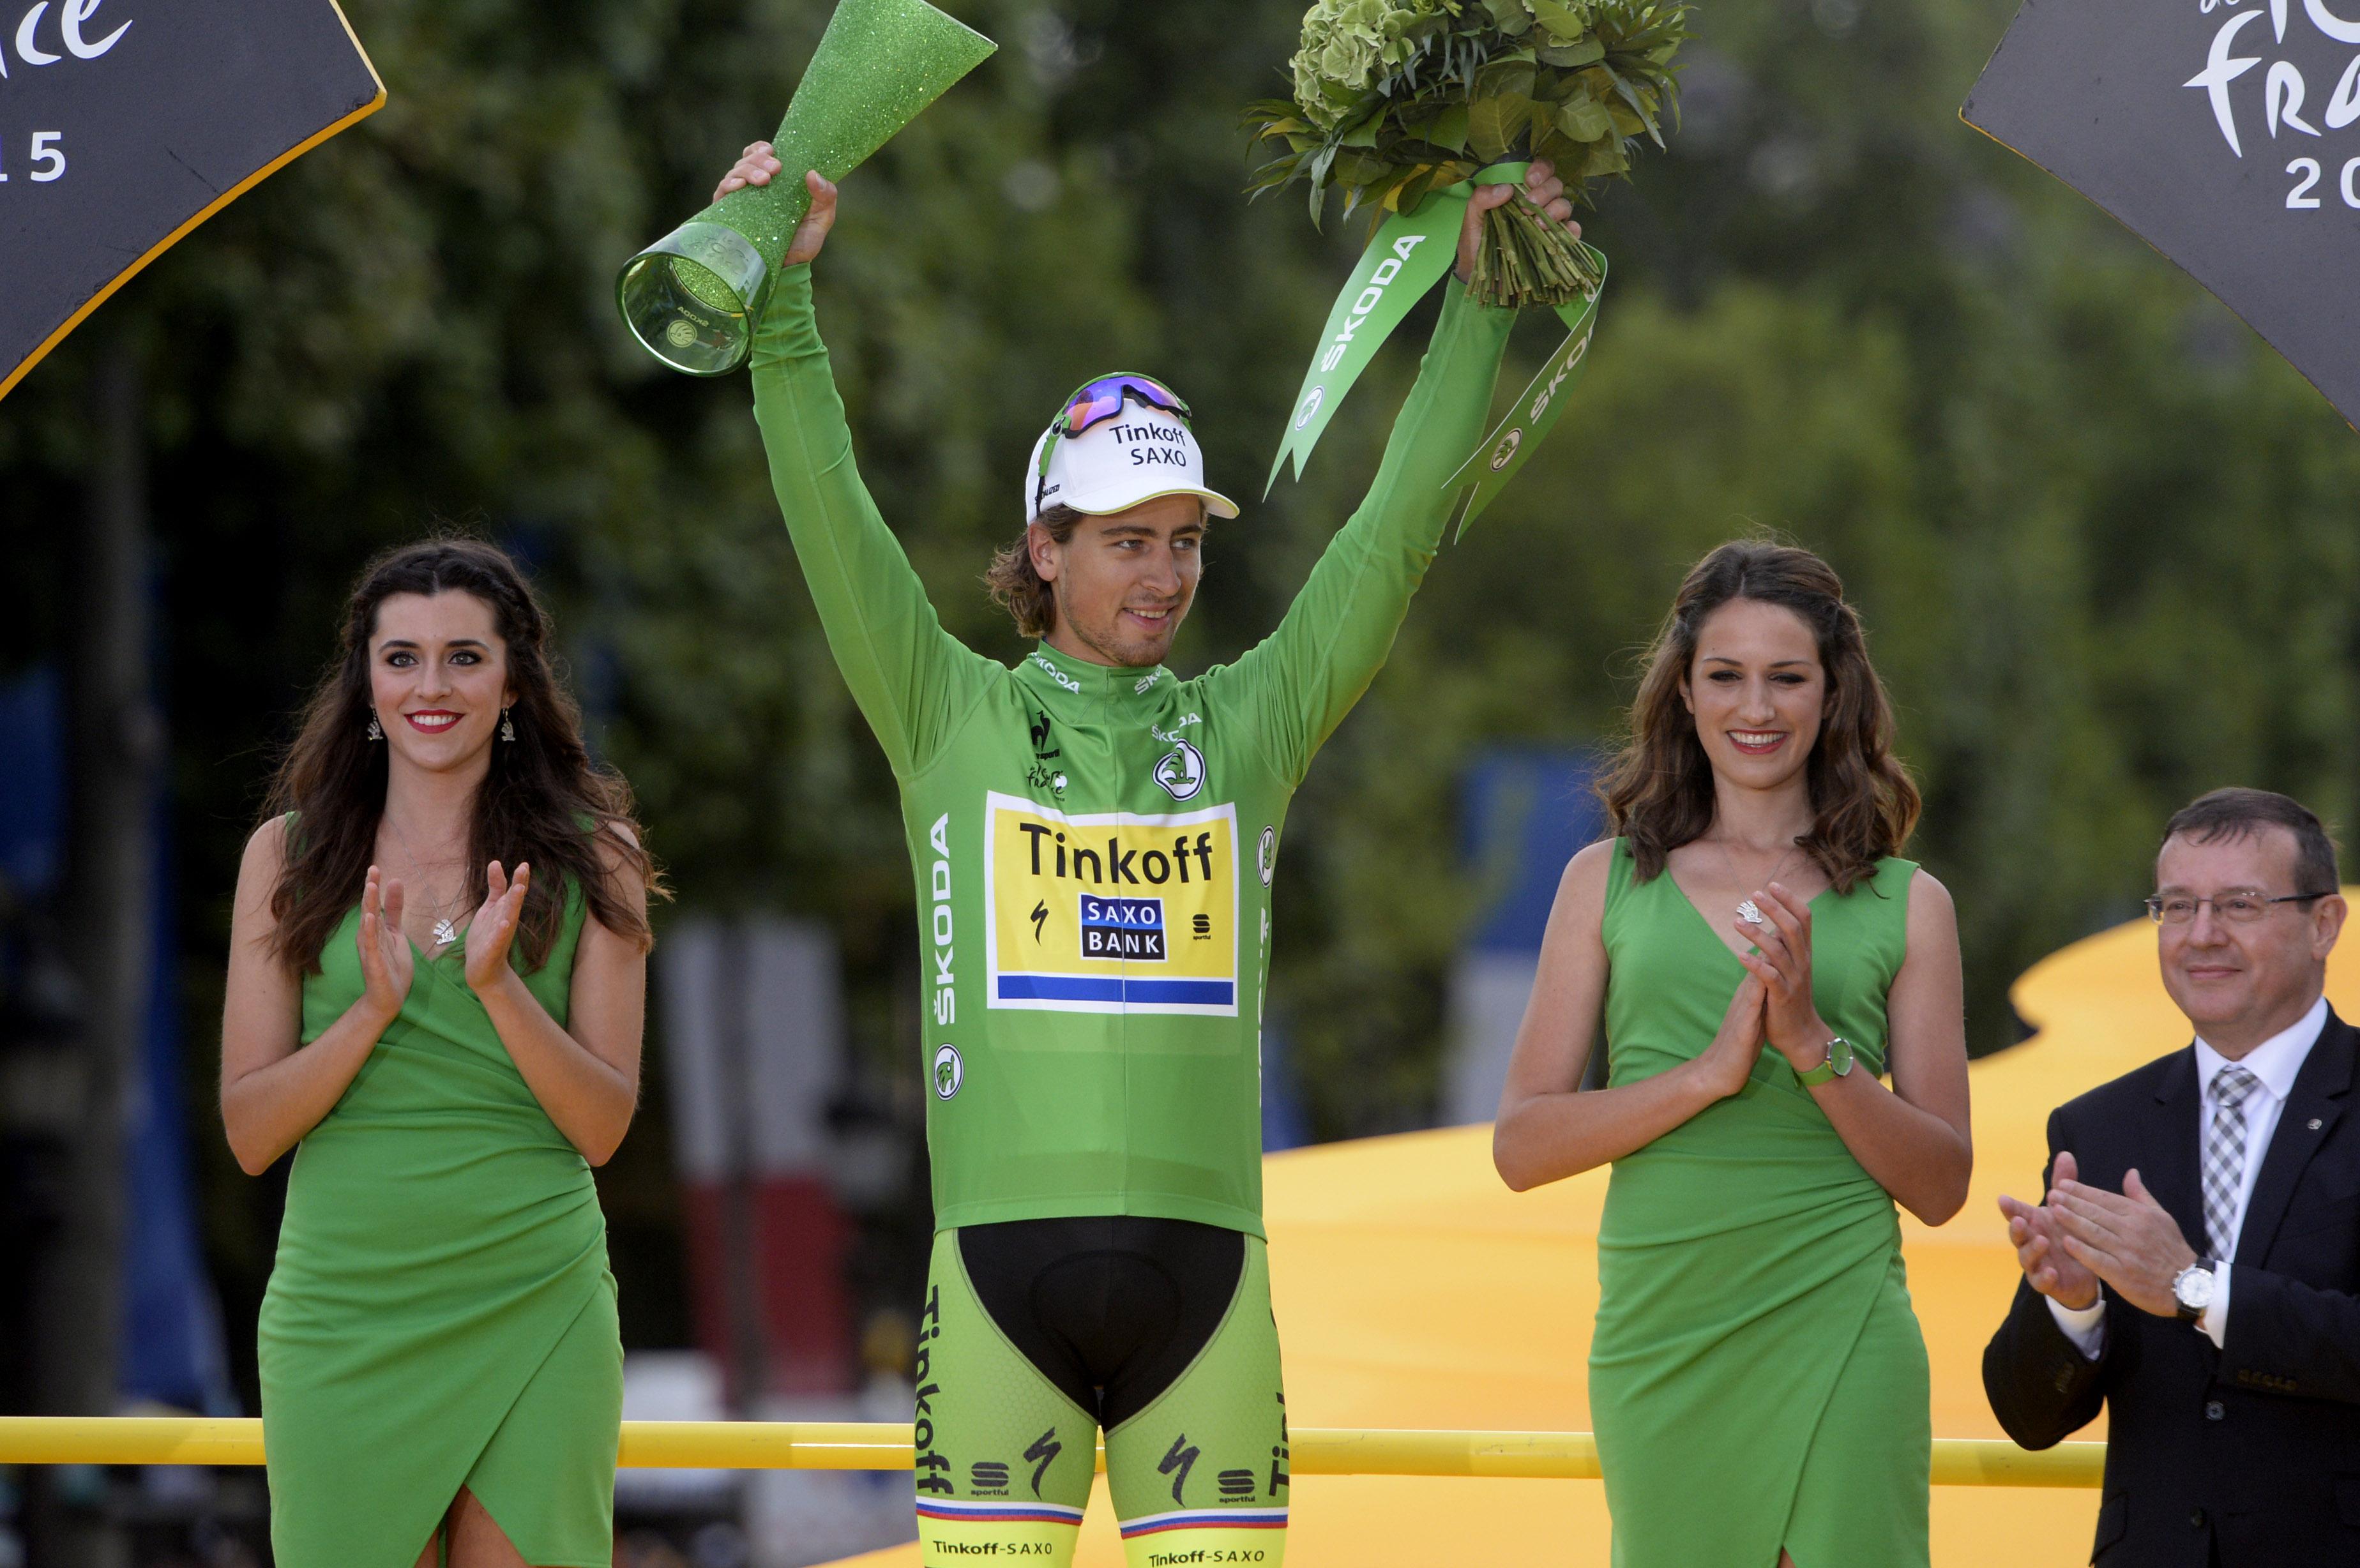 Peter Sagan hat die Sprintwertung der Tour de France 2015 gewonnen. (pic: Sirotti)